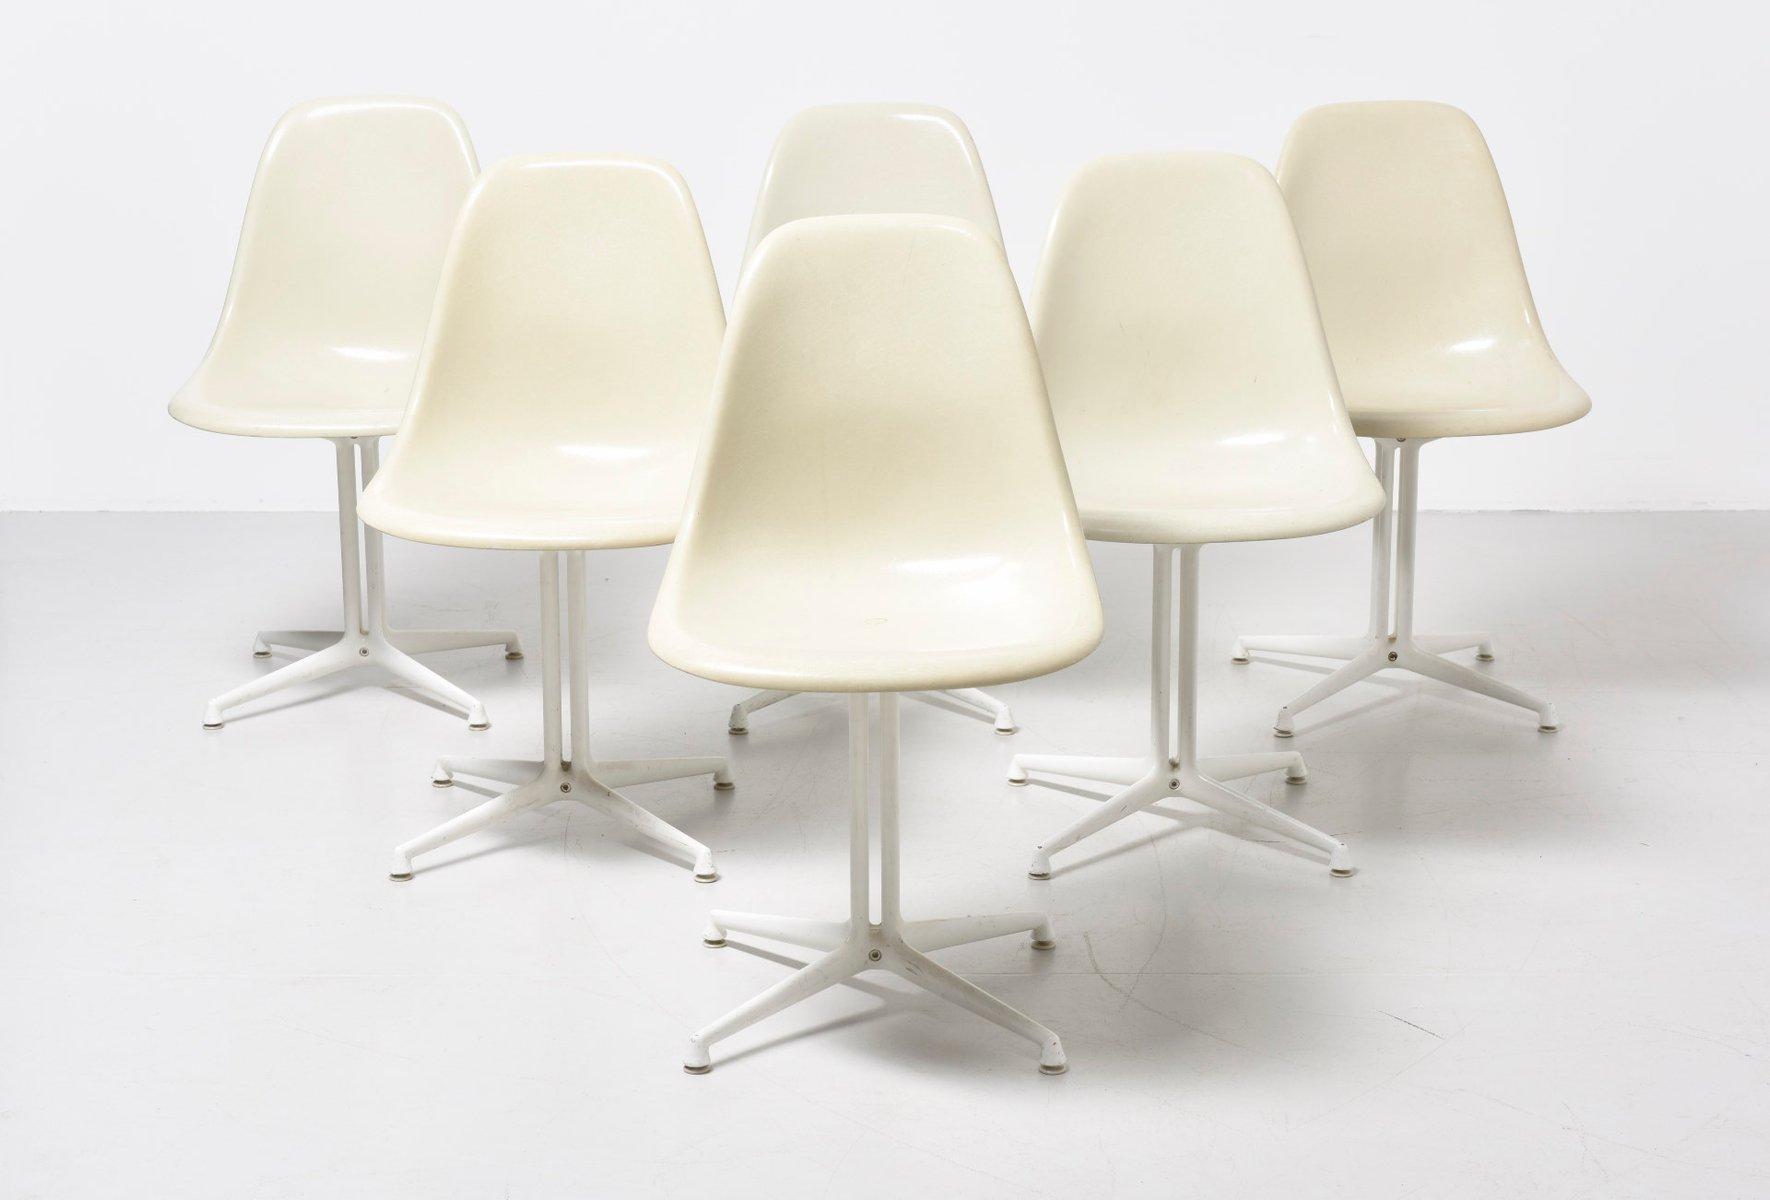 Sedie Ufficio Eames : Sedie dsw vintage con base la fonda di charles ray eames per